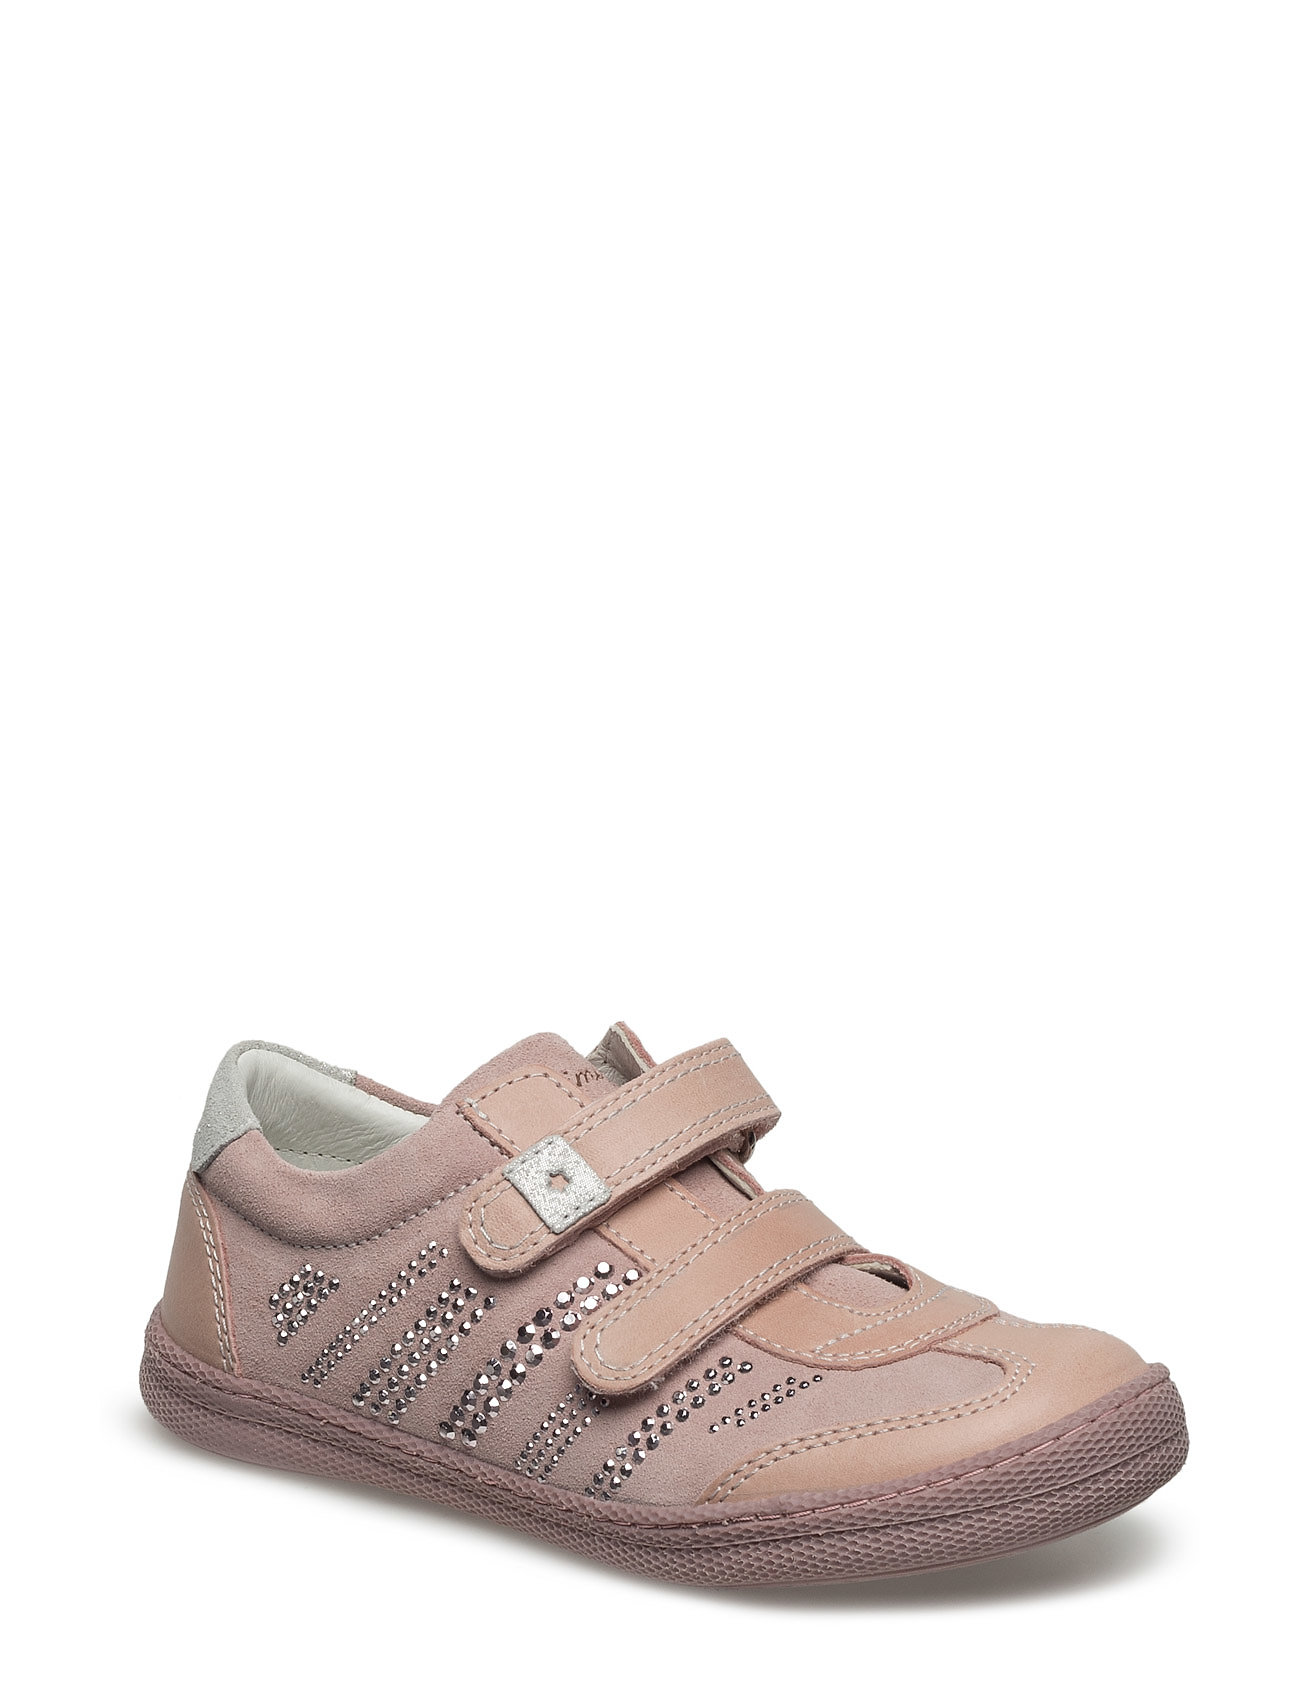 Scarpa Primigi Sko & Sneakers til Børn i